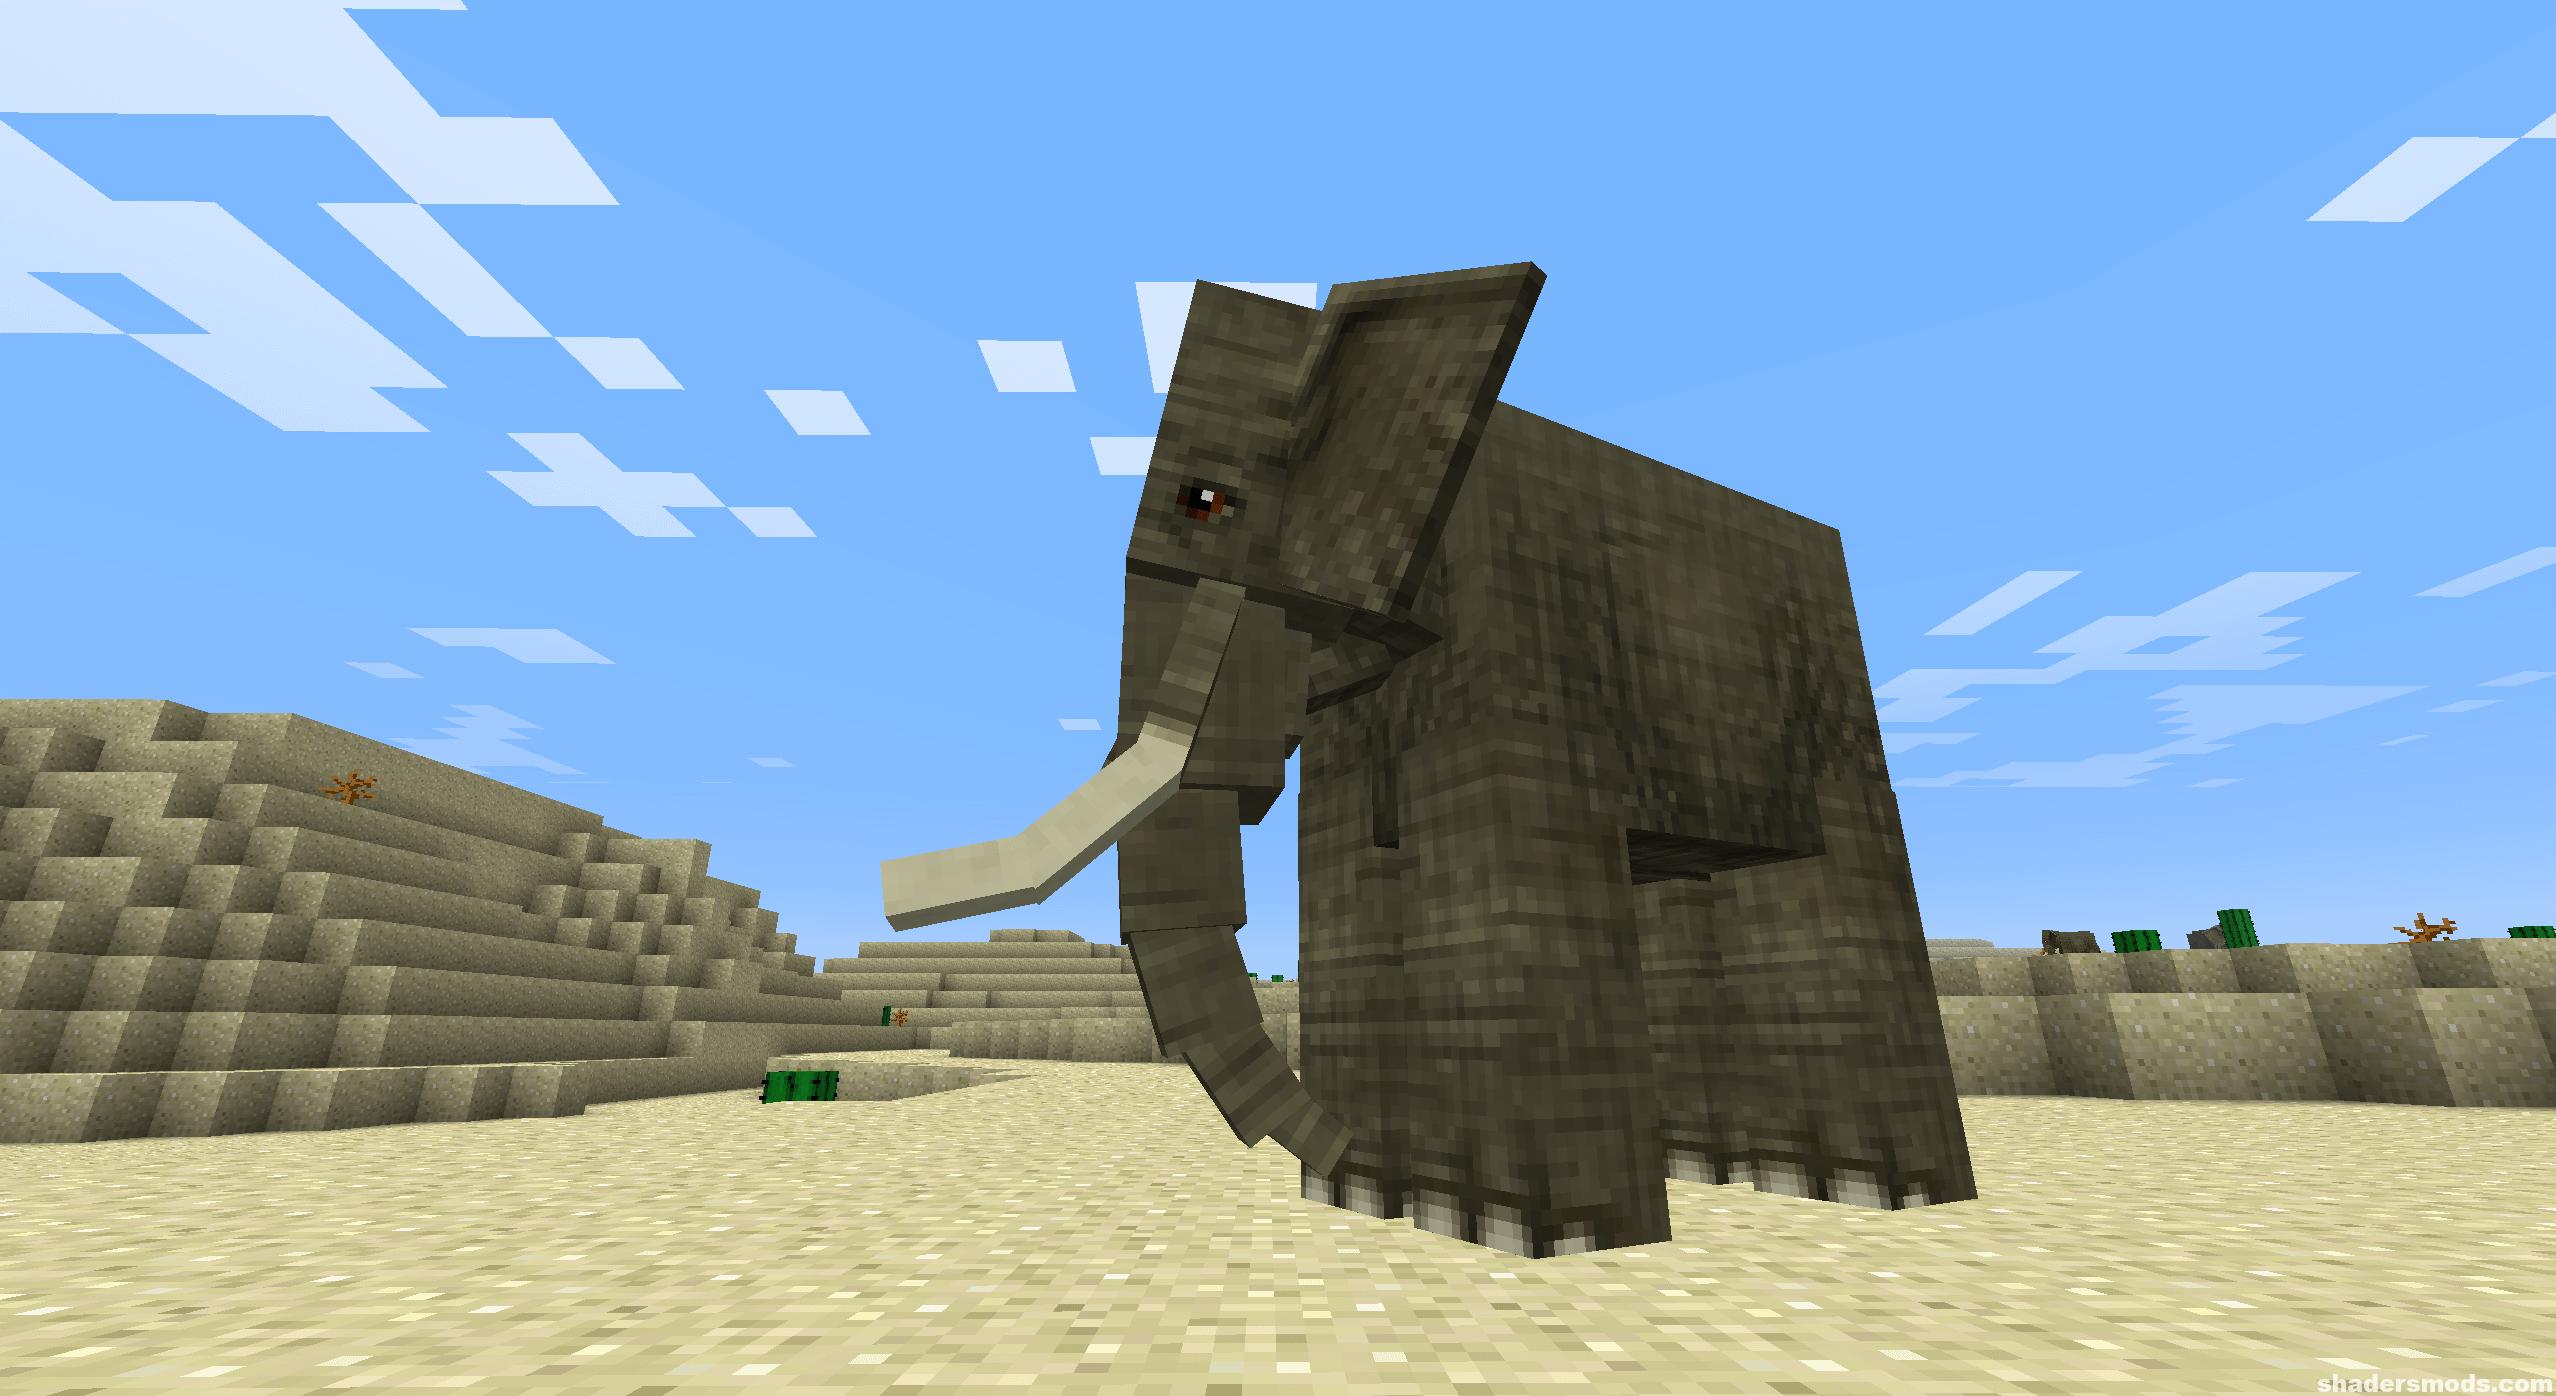 mo-creatures-mod-minecraft-3